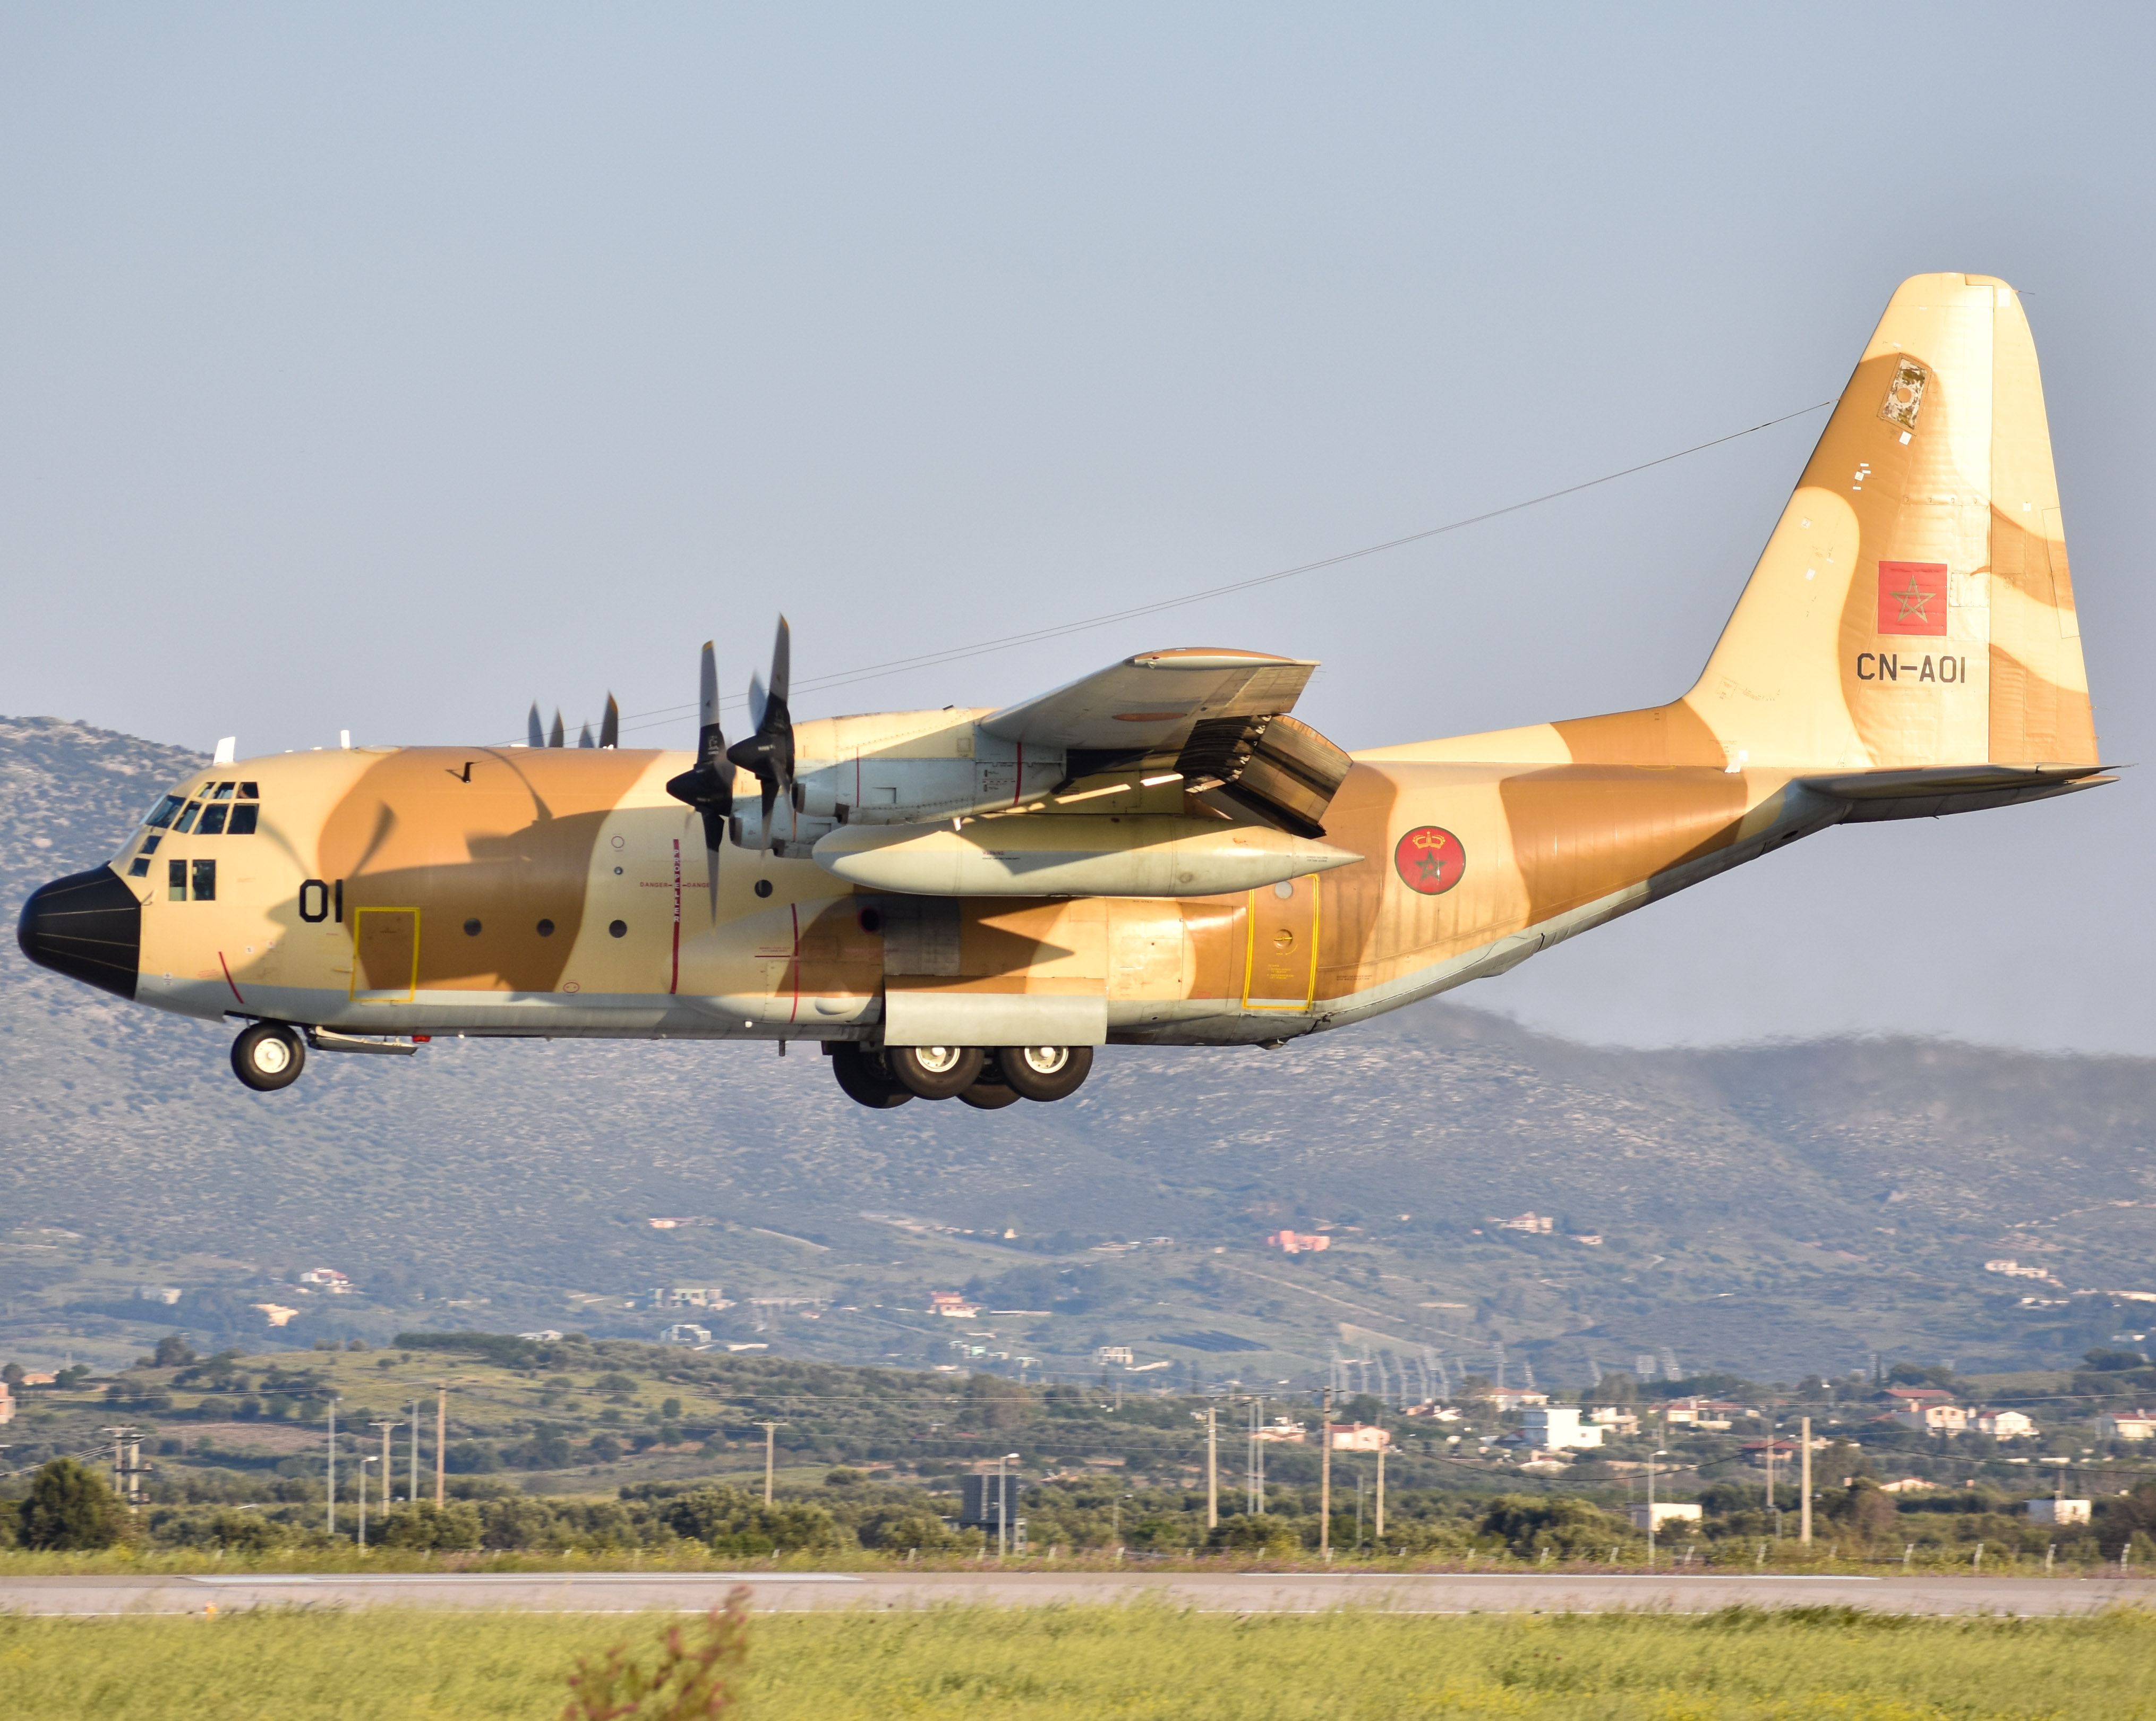 FRA: Photos d'avions de transport - Page 38 32727652207_b150663c3b_o